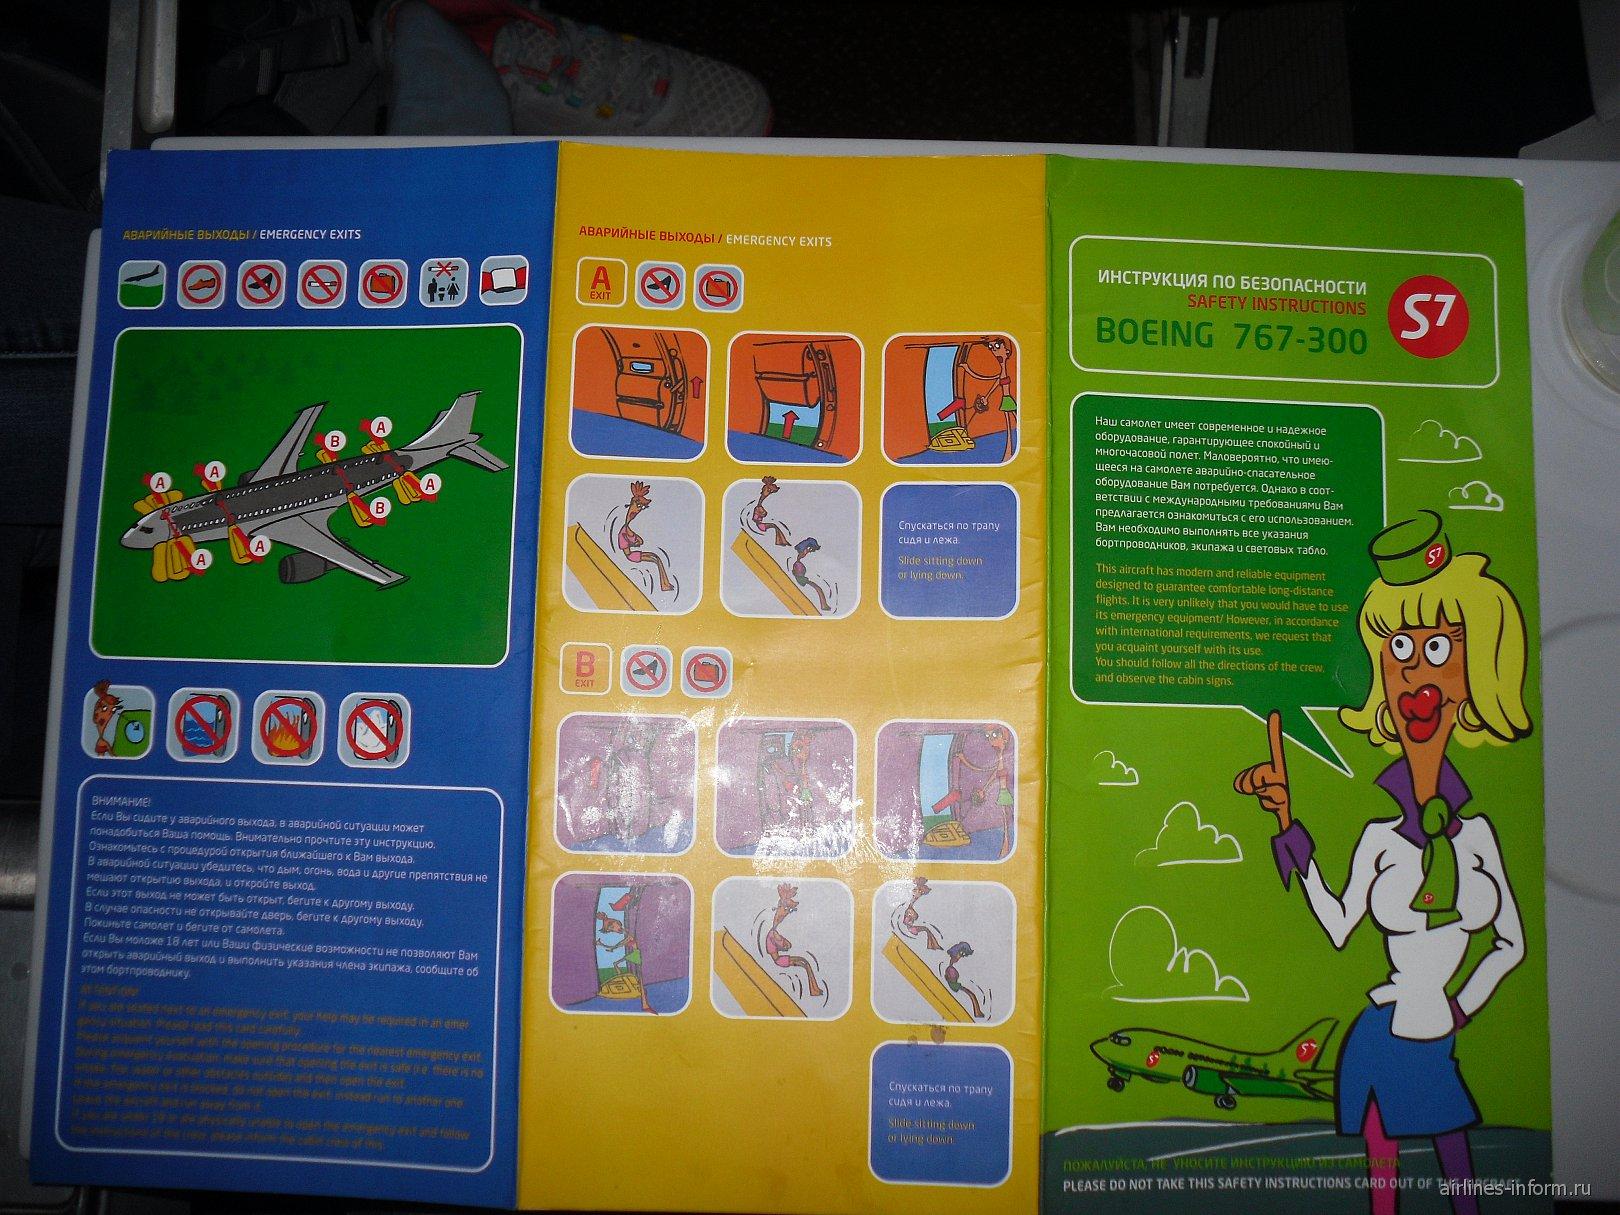 Инструкция по безопасности авиакомпании S7 Airlines